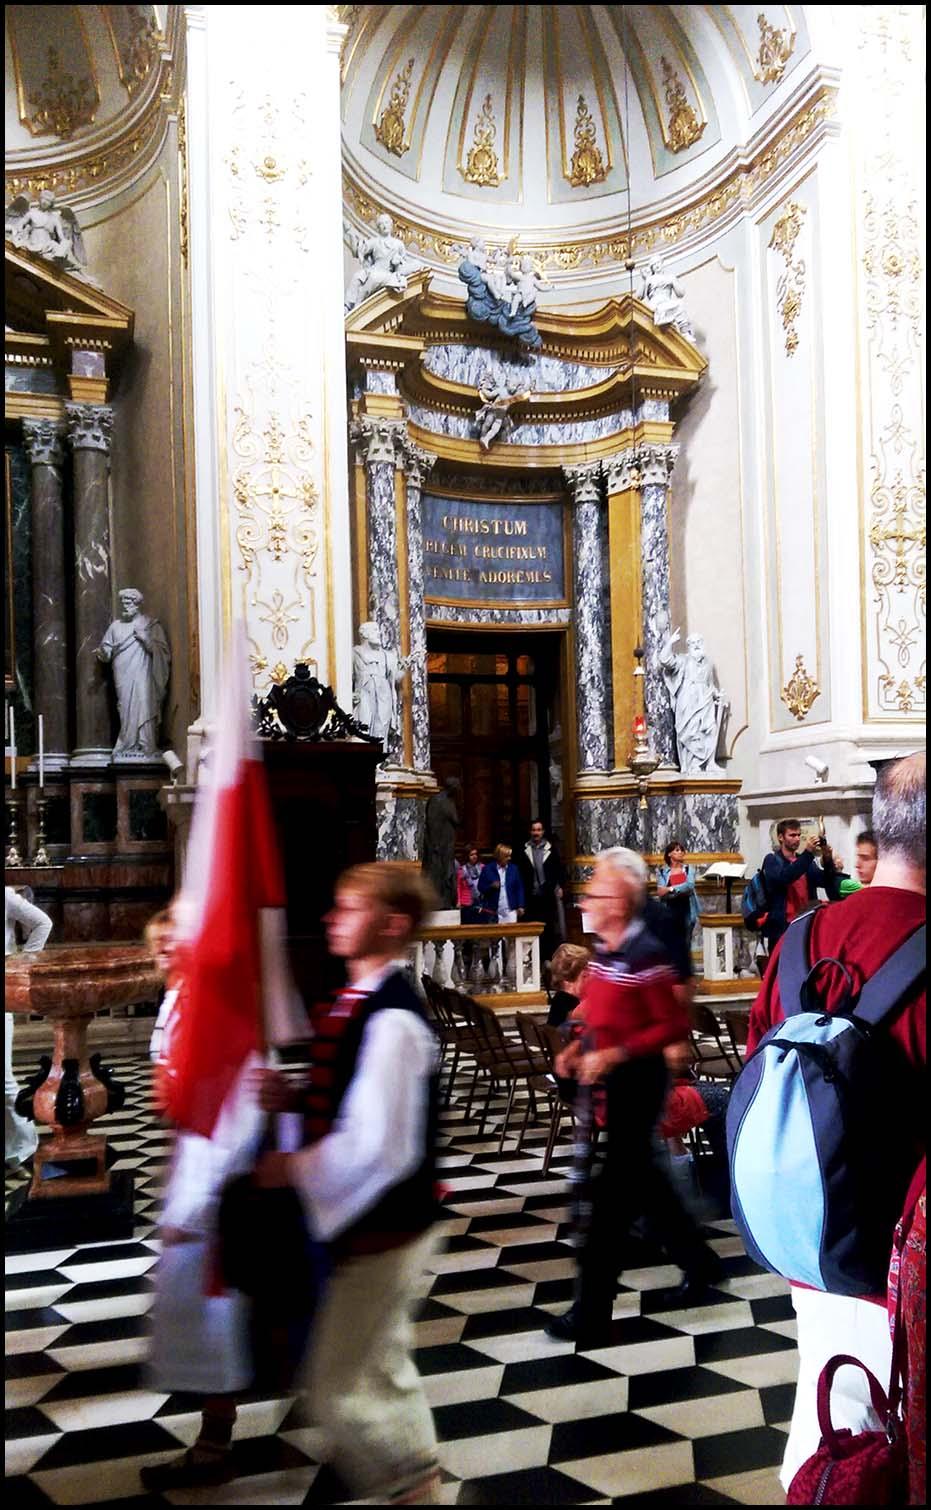 Sunday Mass, Cattedrale di Bergamo